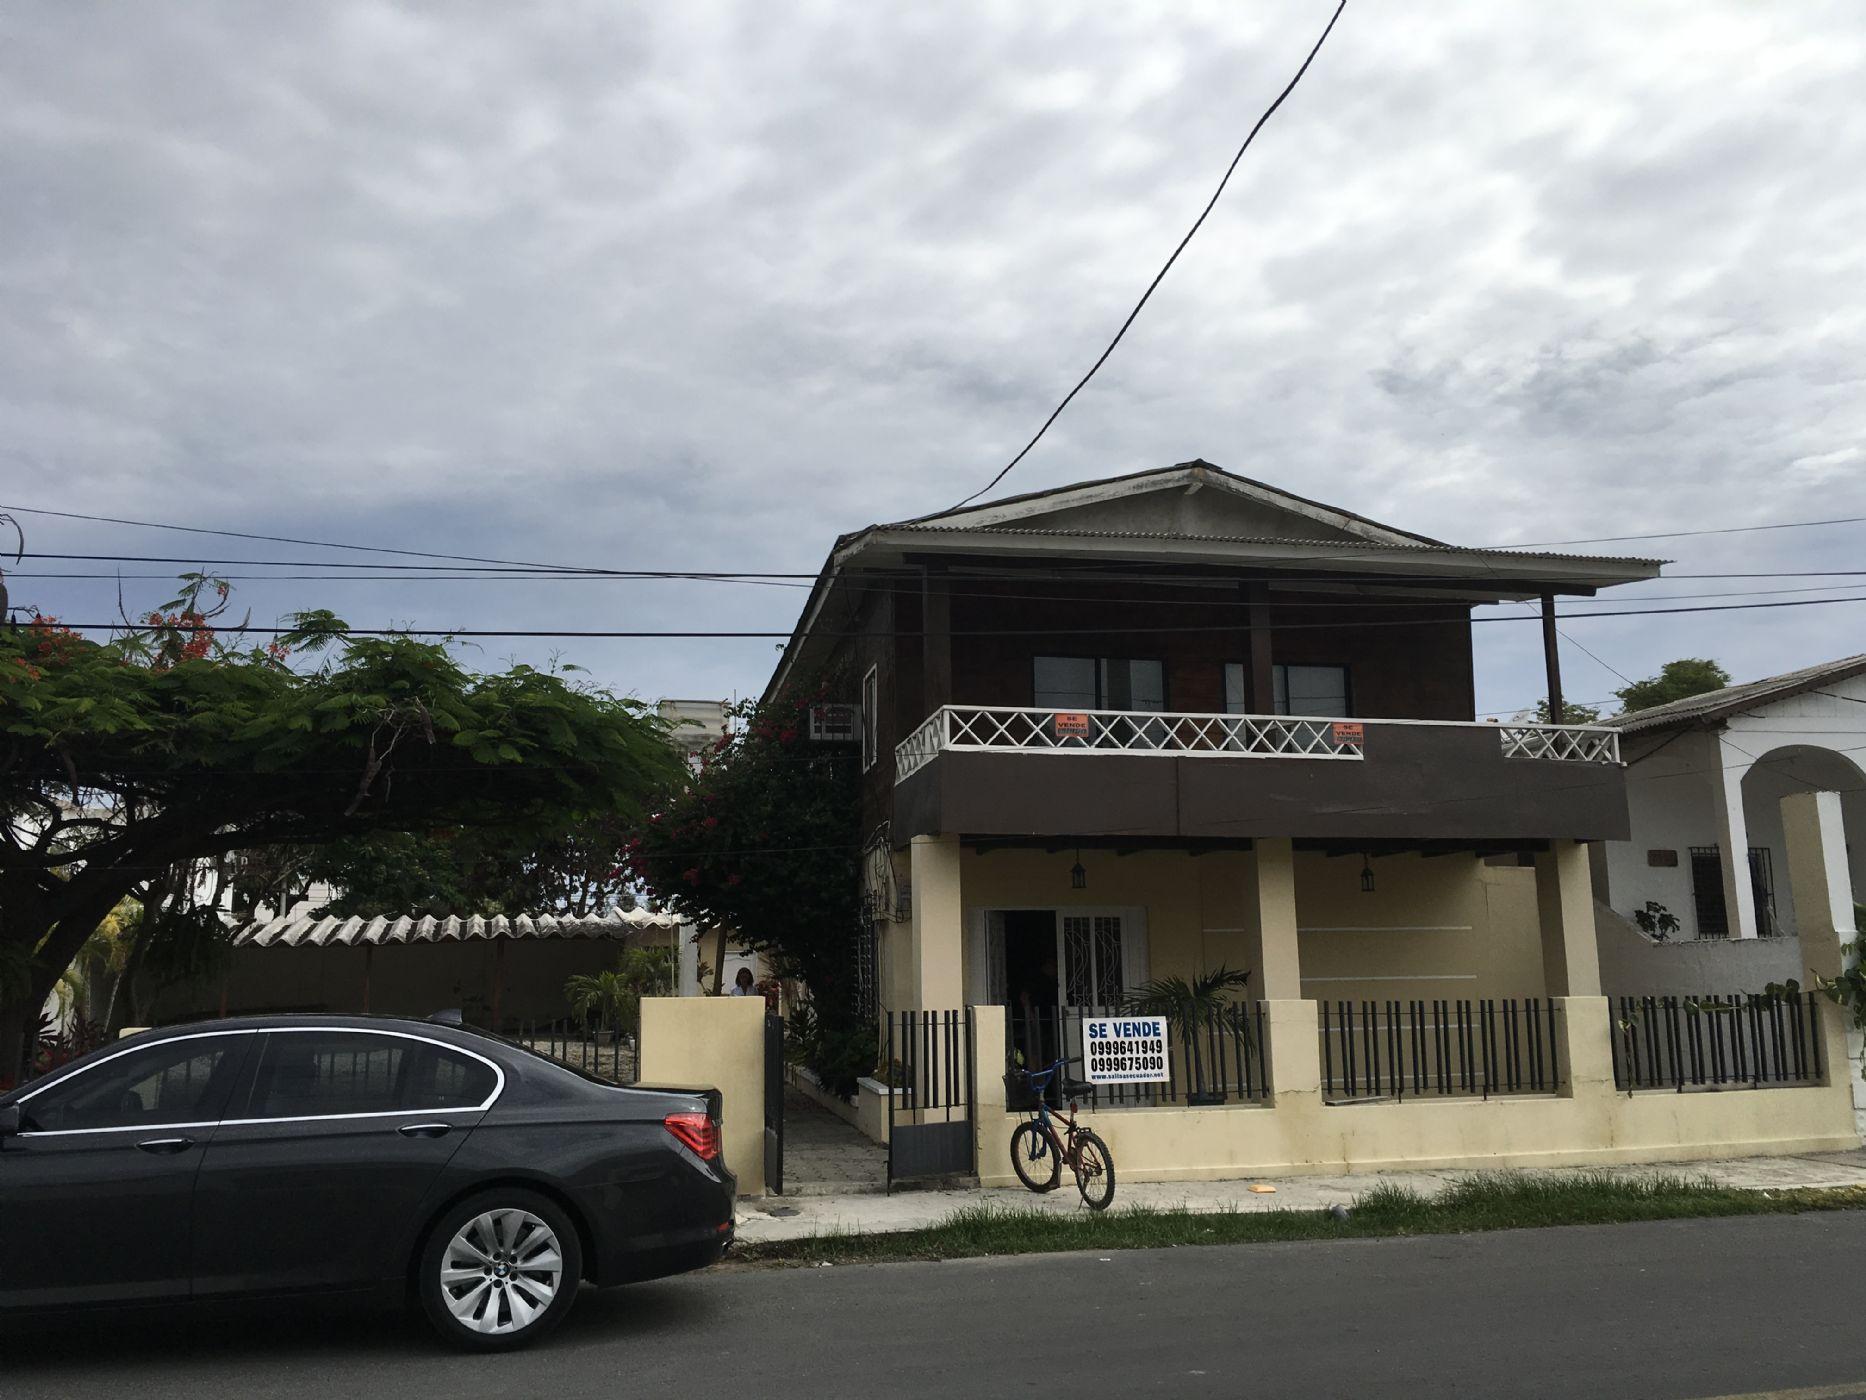 Salinas-Ecuador-property-500238-1.JPG